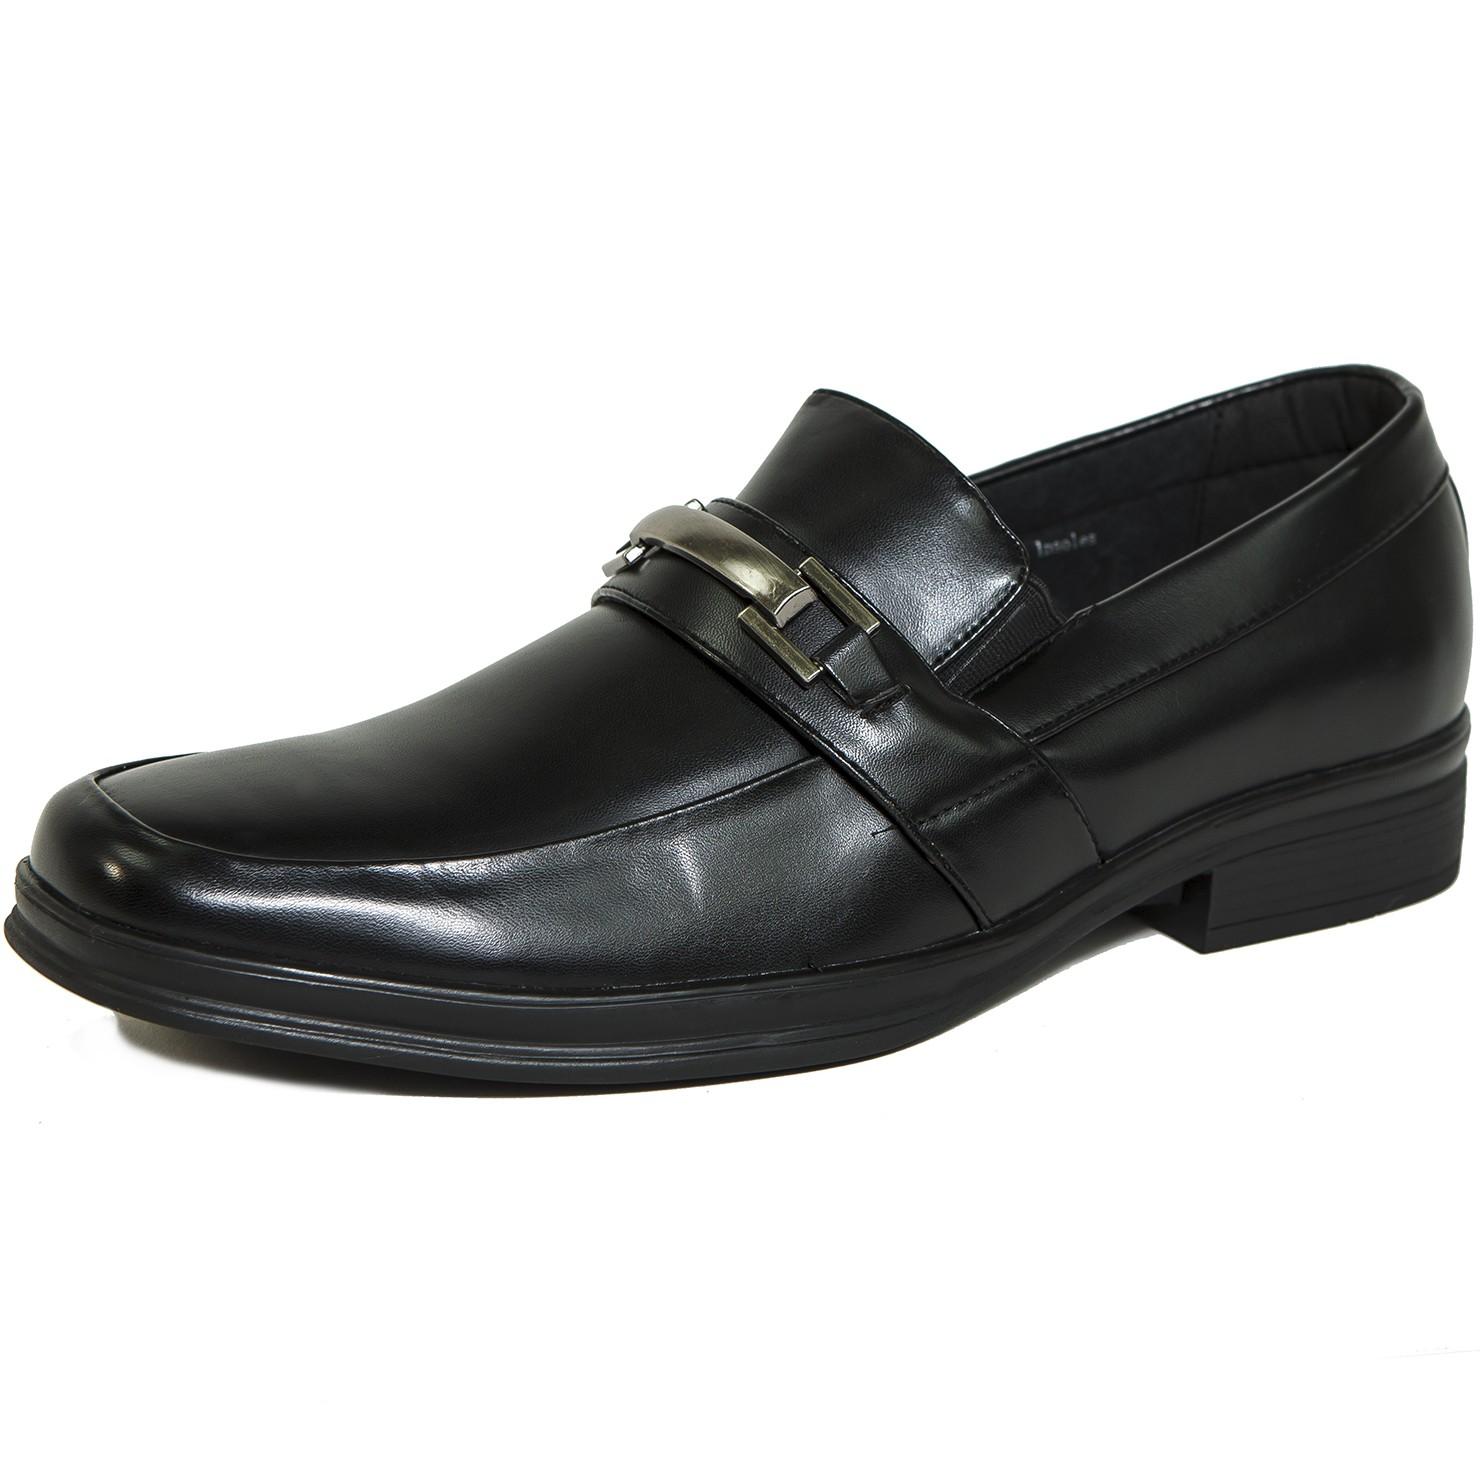 Mens Suede Buckle Shoes